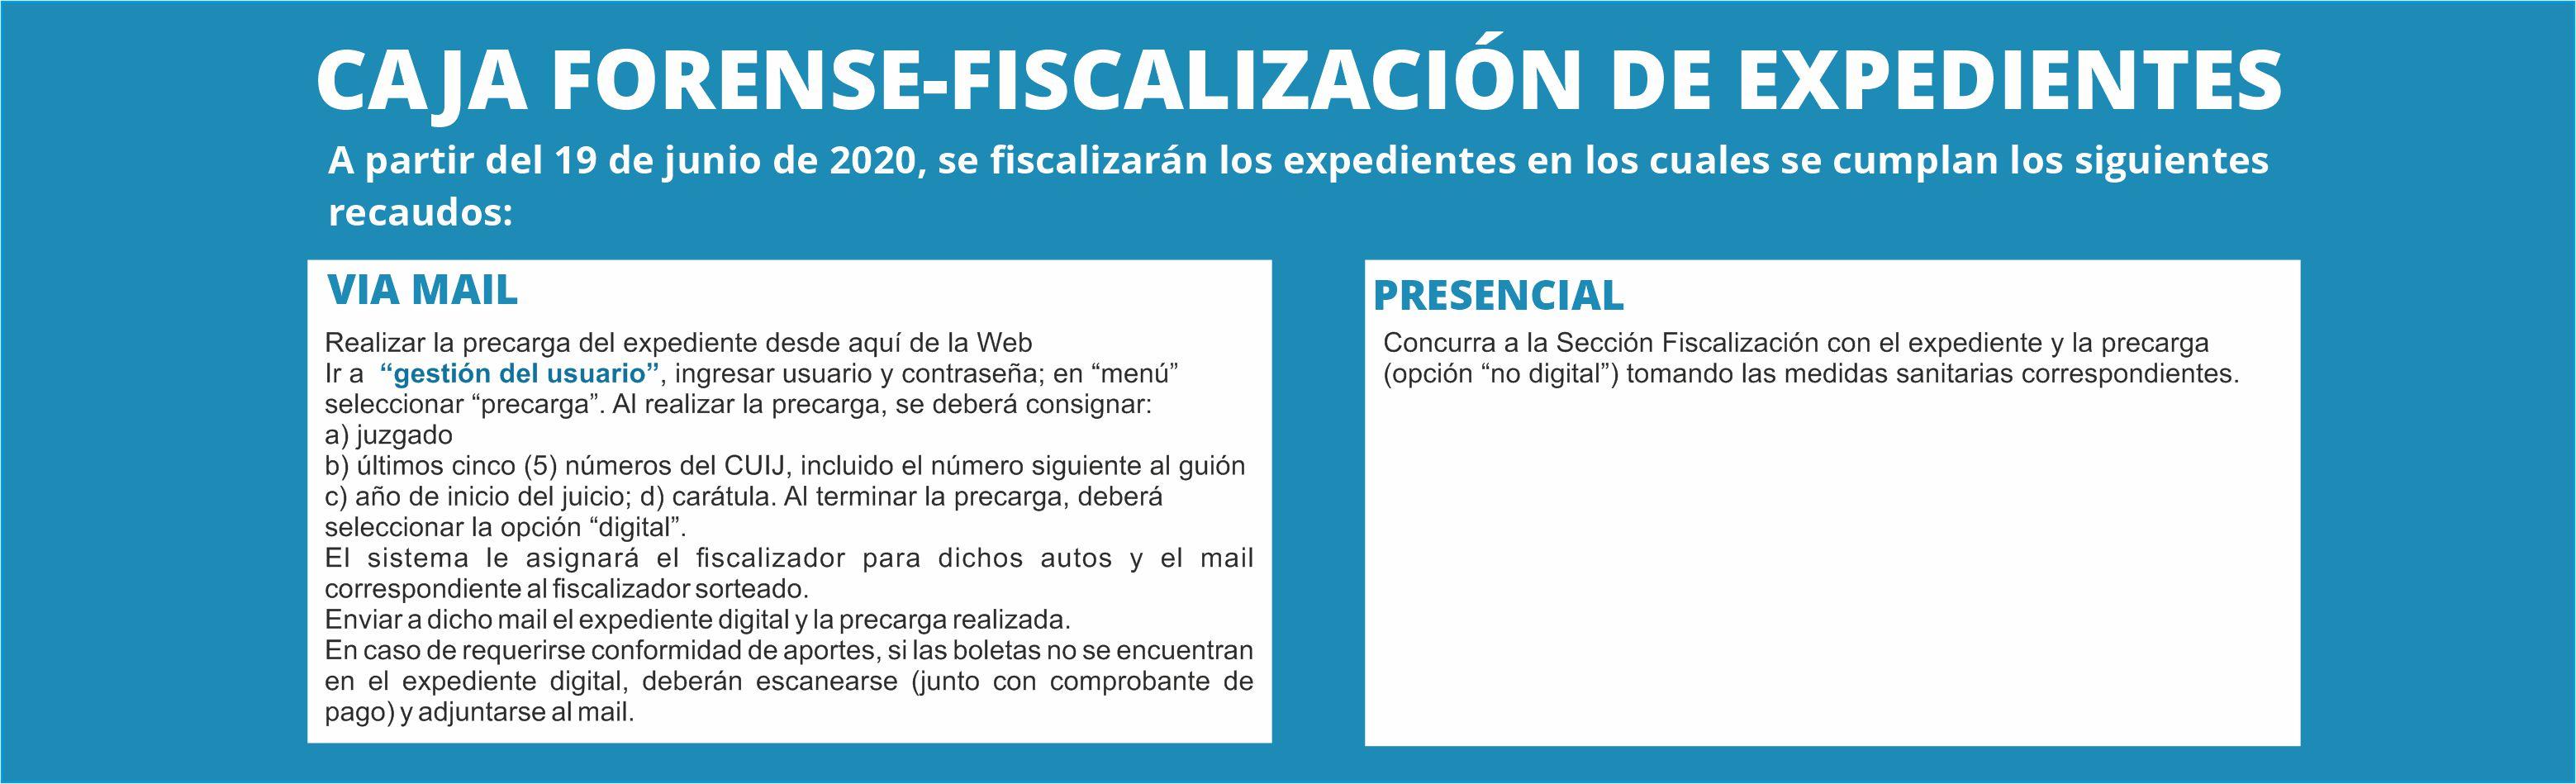 fiscalizacion-expendientes1